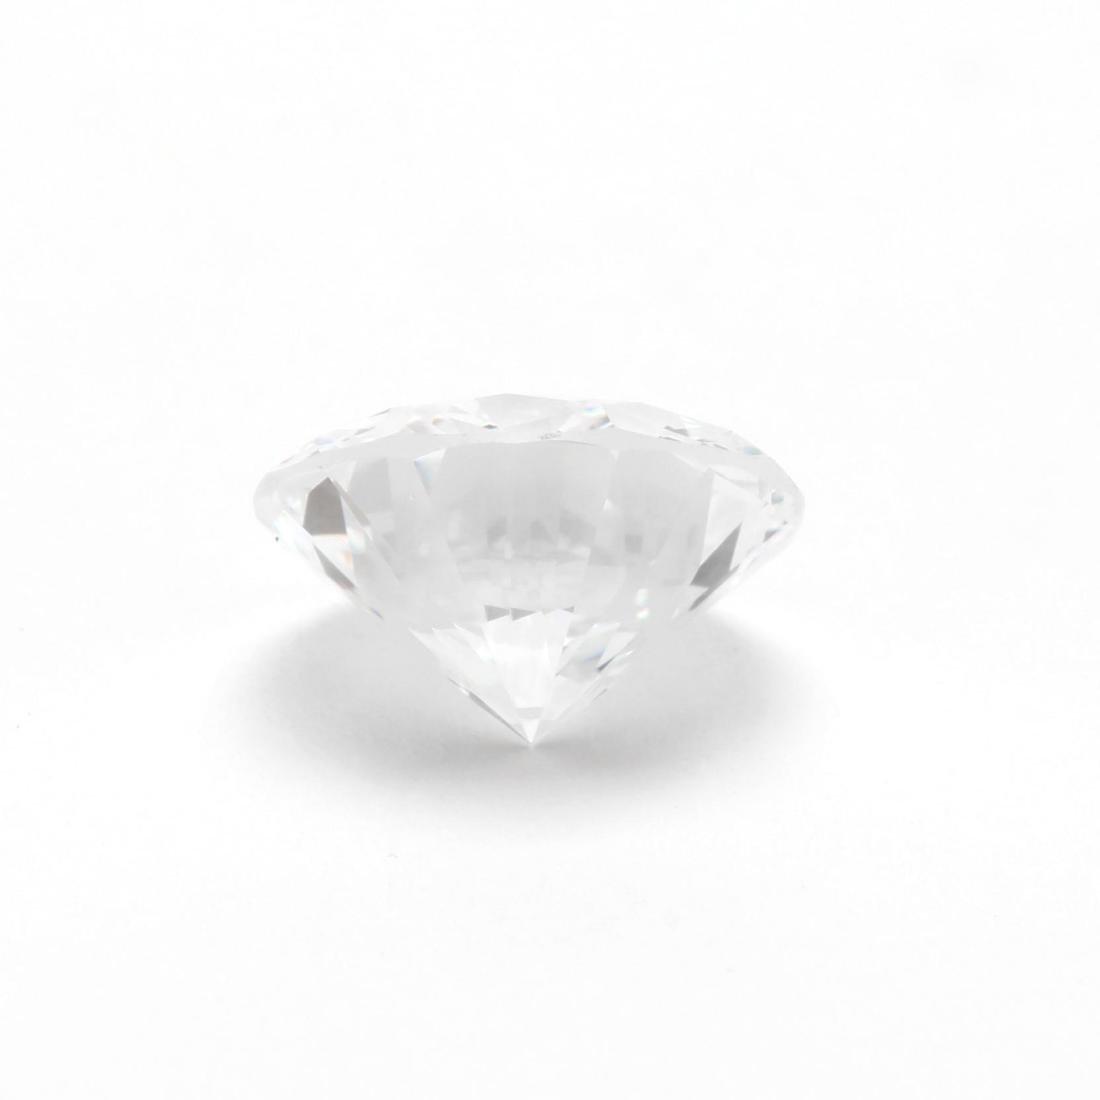 Unmounted Round Brilliant Cut Diamond with Platinum and - 4